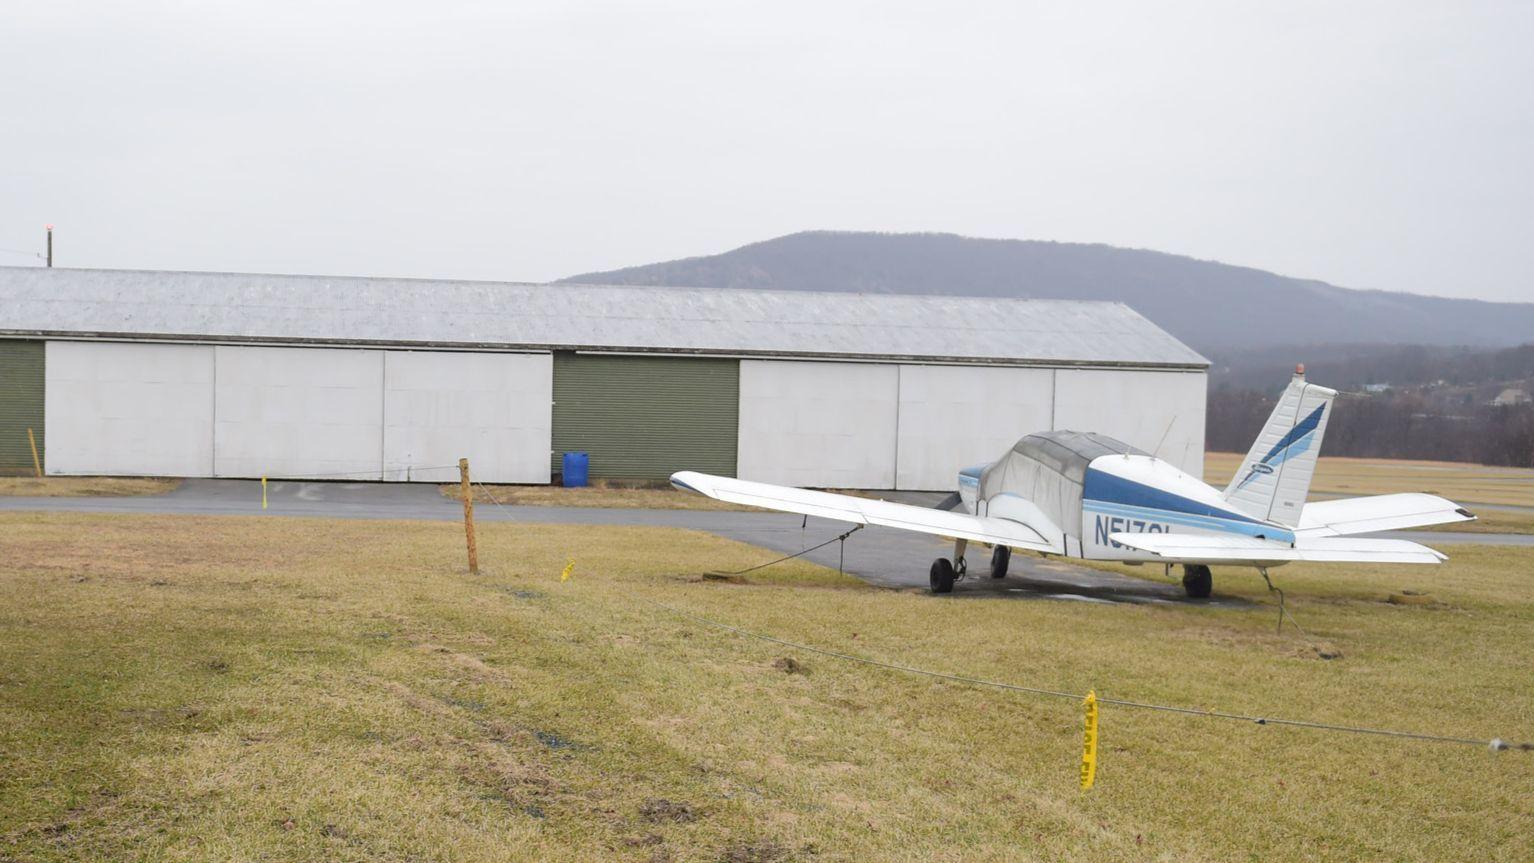 Slatington Airport